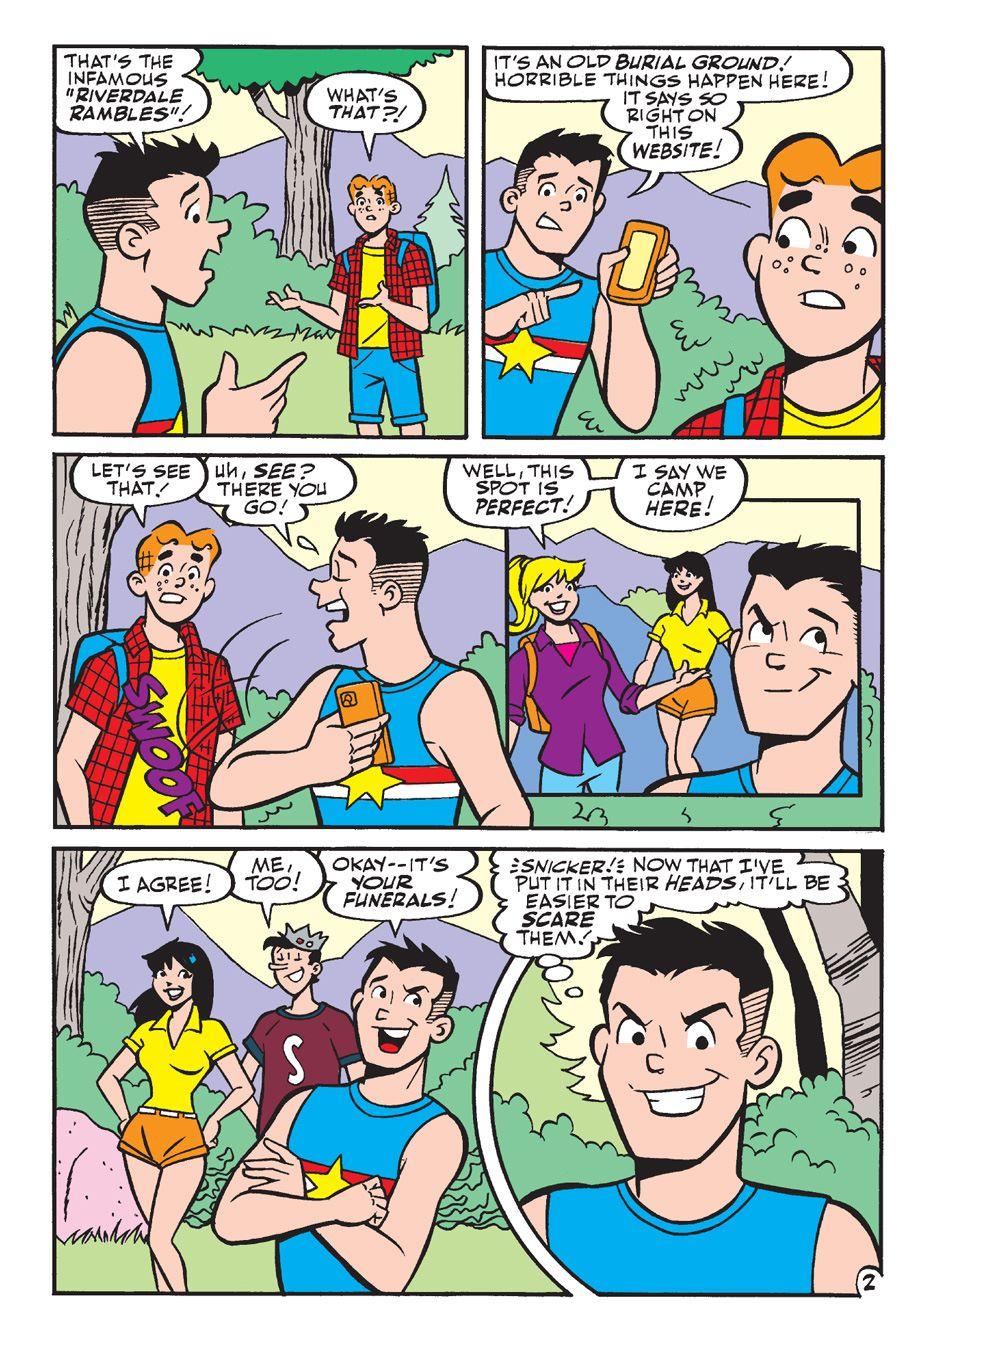 ArchieJumboComicsDigest_323-3 ComicList Previews: ARCHIE JUMBO COMICS DIGEST #323